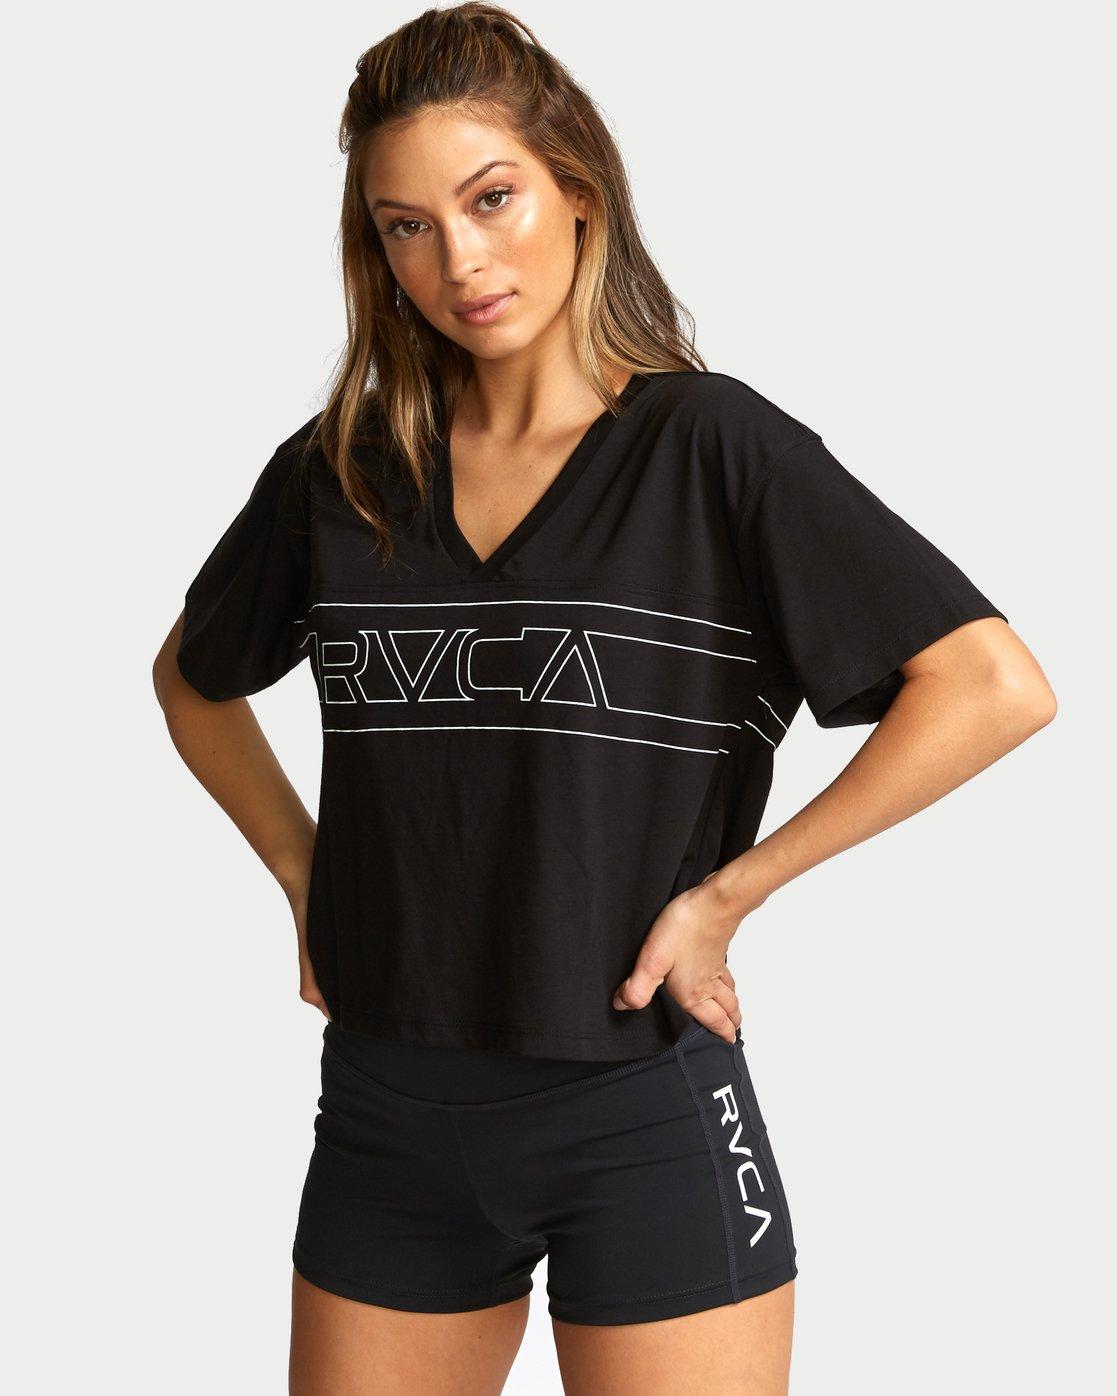 0 V Boxy  - hort Sleeve Sports T-Shirt  Q4TPWDRVF9 RVCA